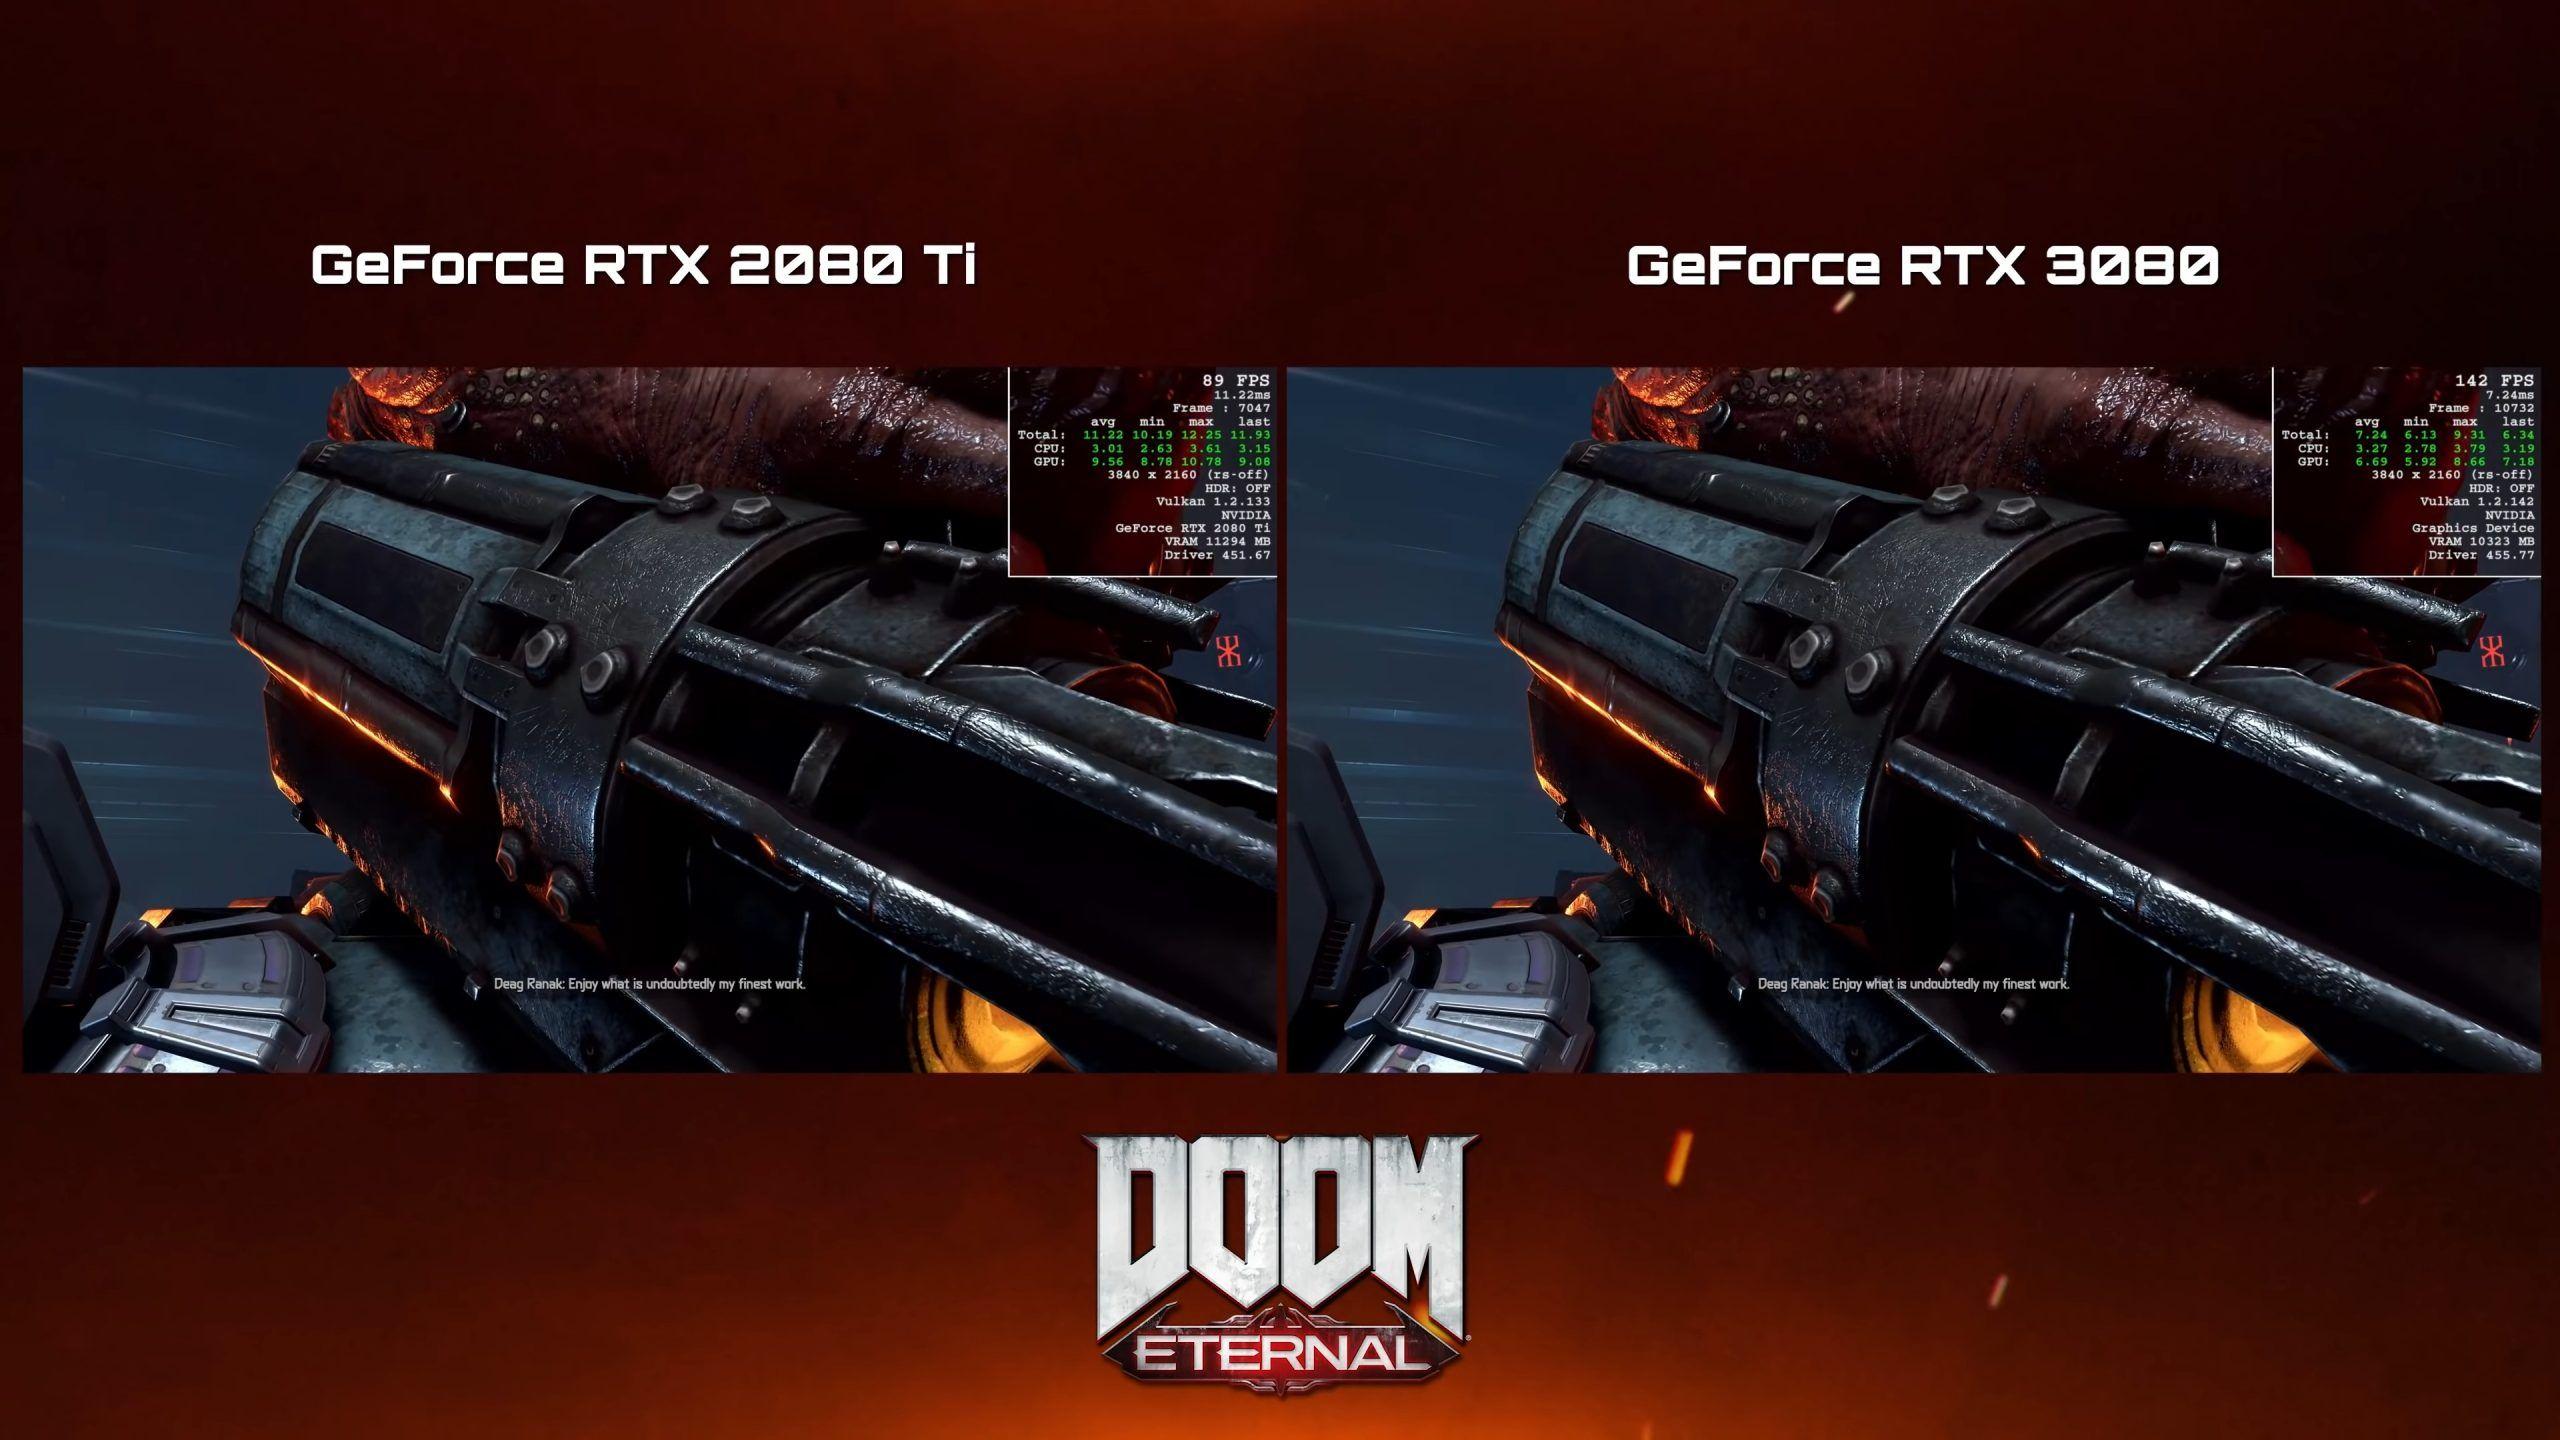 RTX 3080 vs rtx 2080 ti Doom Eternal